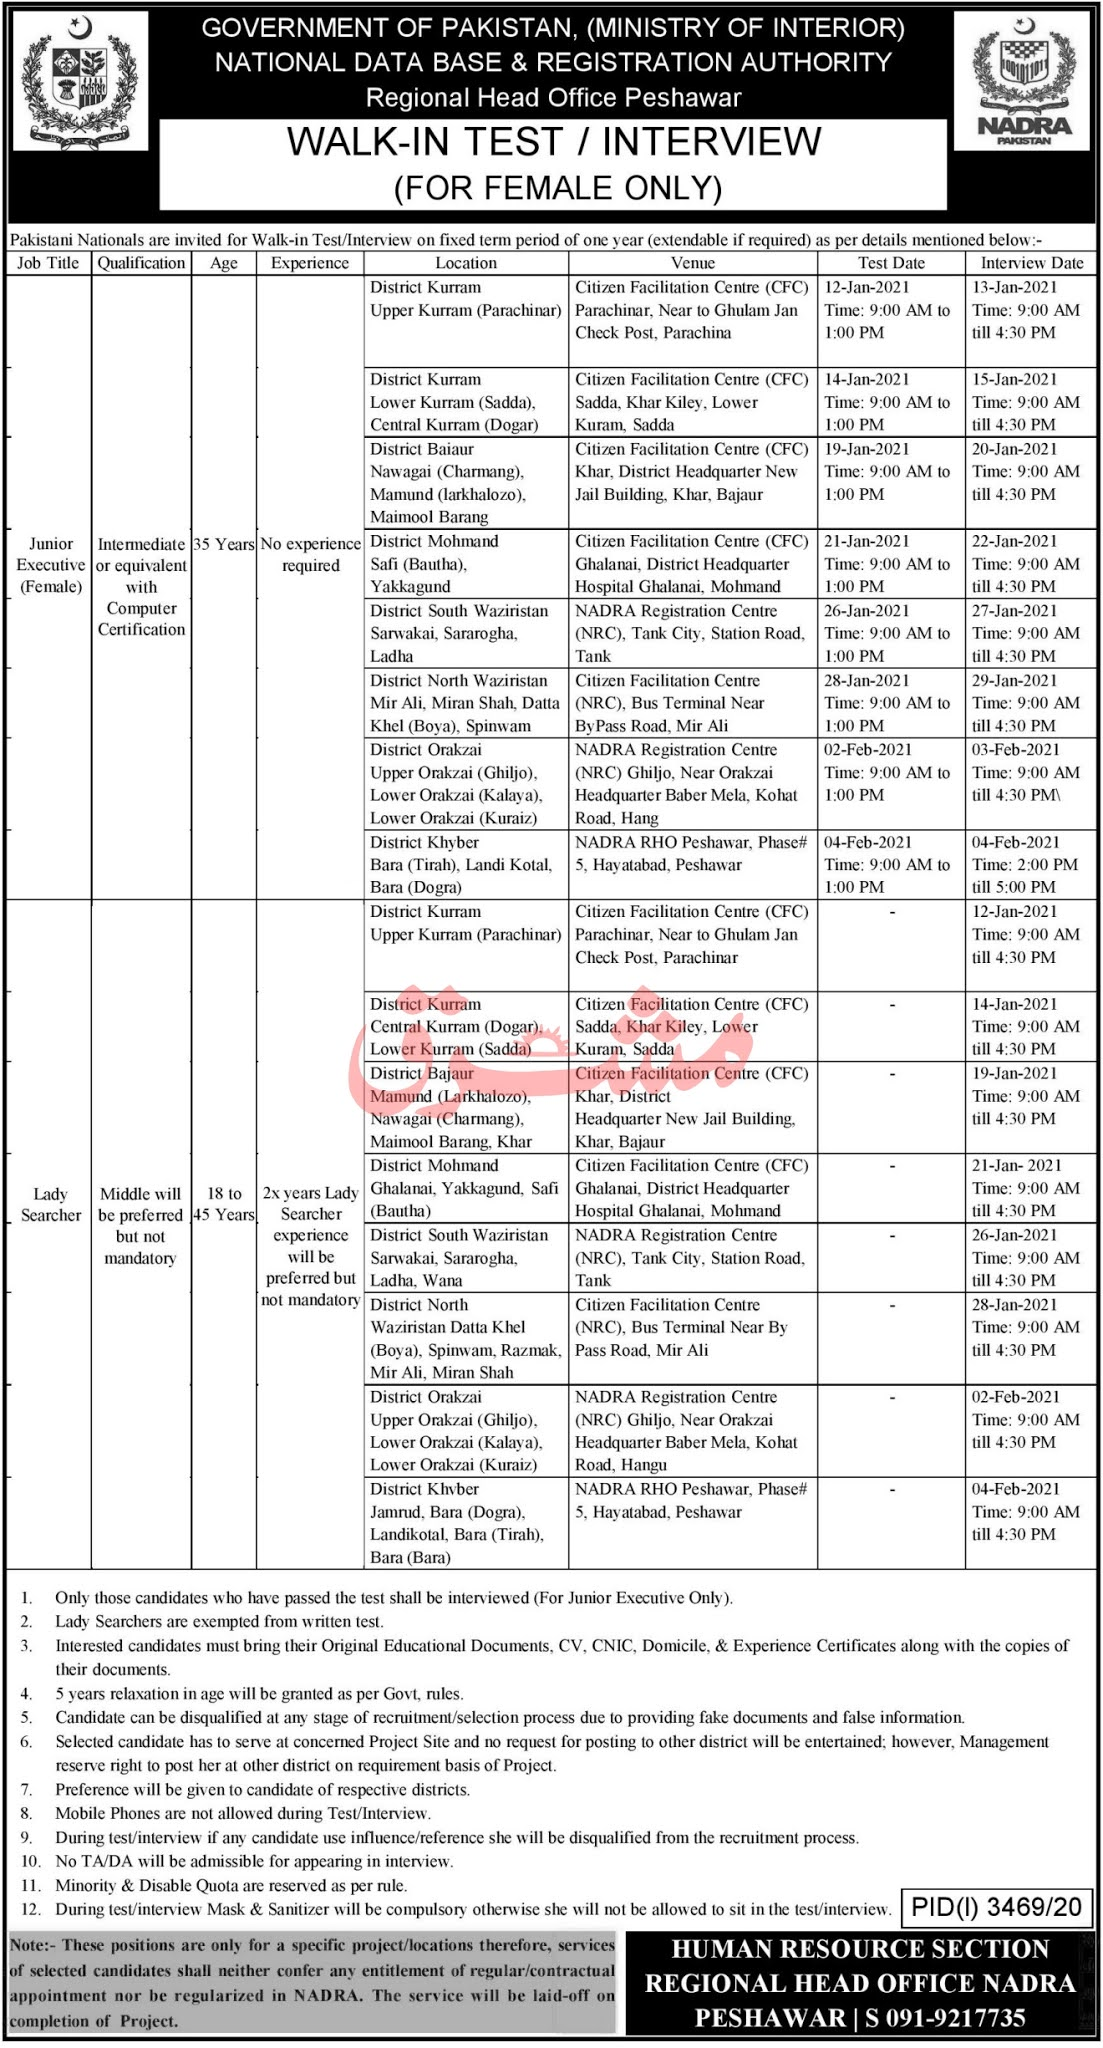 ehsaas.labour.nadra.gov.pk - NADRA ONLINE - NADRA NICOP - NADRA Card - Pakistan NADRA CARD - NADRA Jobs 2021 - National Database And Registration Authority Jobs 2021 - NADRA Pakistan - NADRA Database - NADRA Office - CNIC NADRA Verification